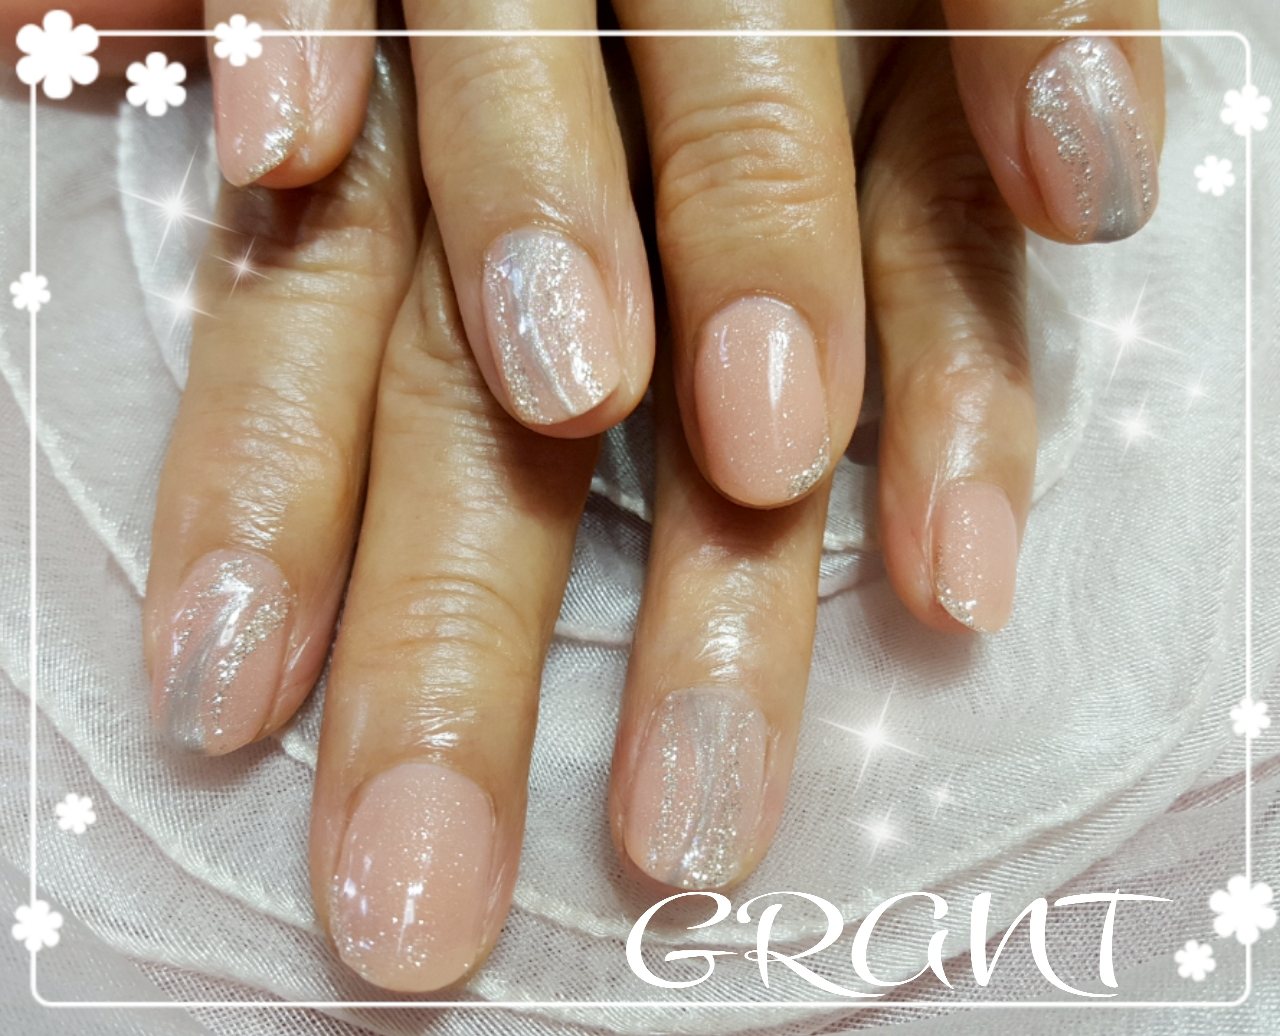 http://www.nail-grant.com/16-10-23-13-43-14-131_deco.jpg